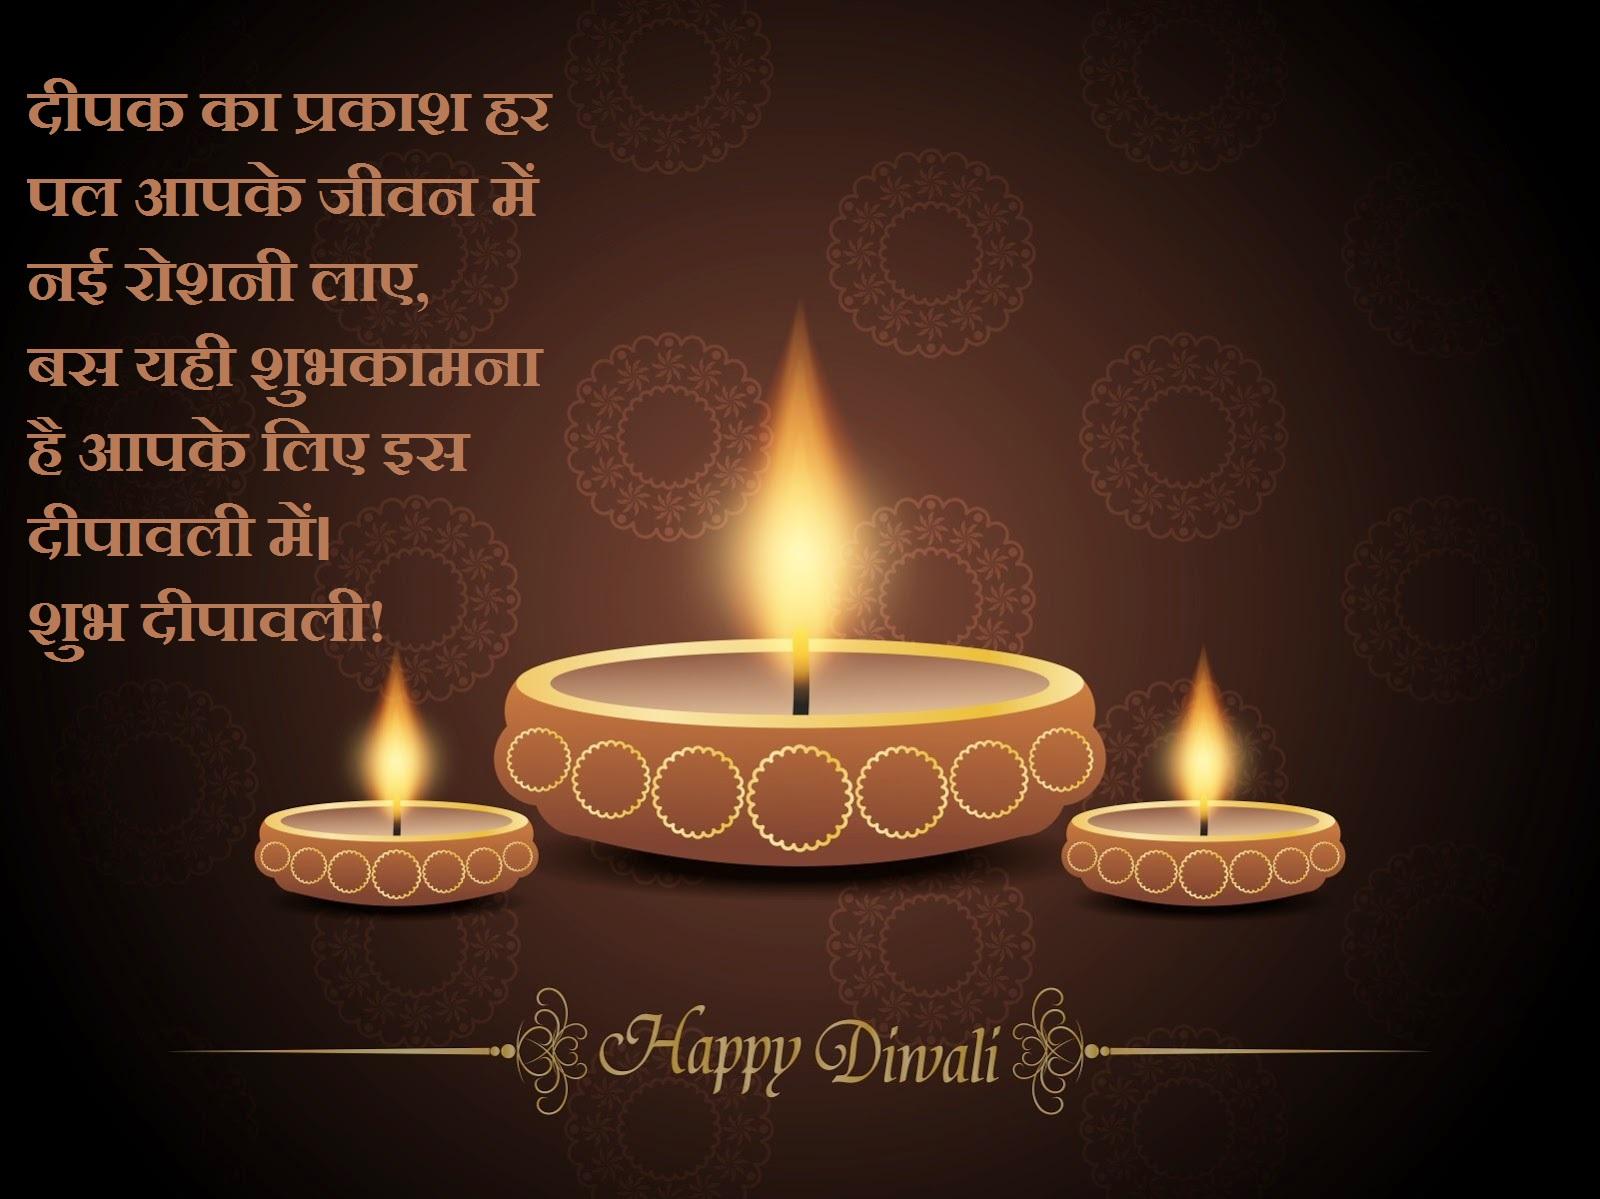 Top 100 deepavali diwali 2017 shubhkamnaye messages sms diwali 2017 shubhkamnaye messages m4hsunfo